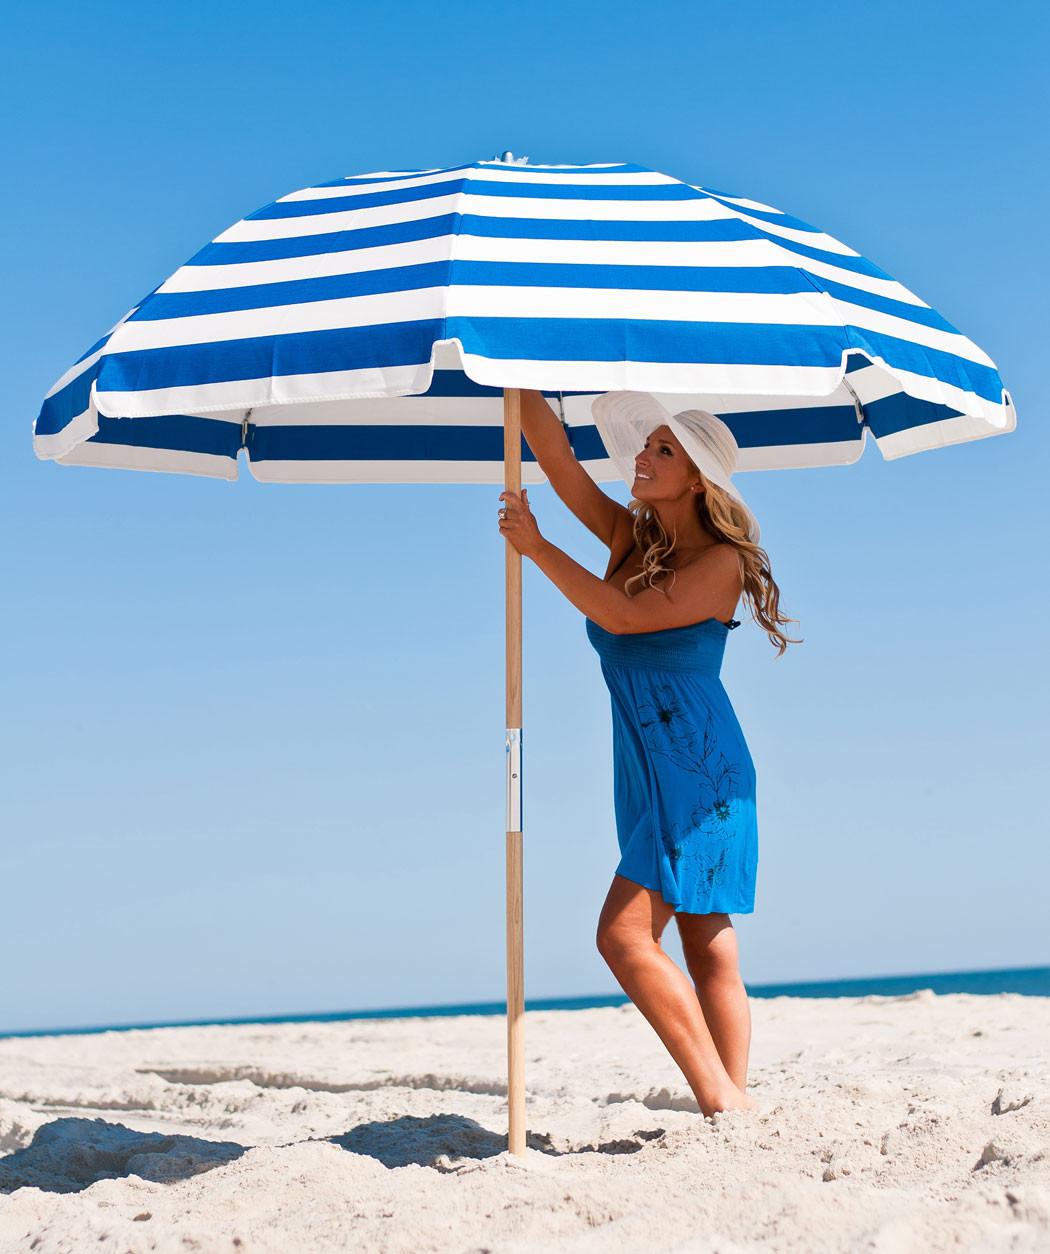 7.5' Diameter Steel Beach Umbrella with 8-Panel Sunbrella® Cover